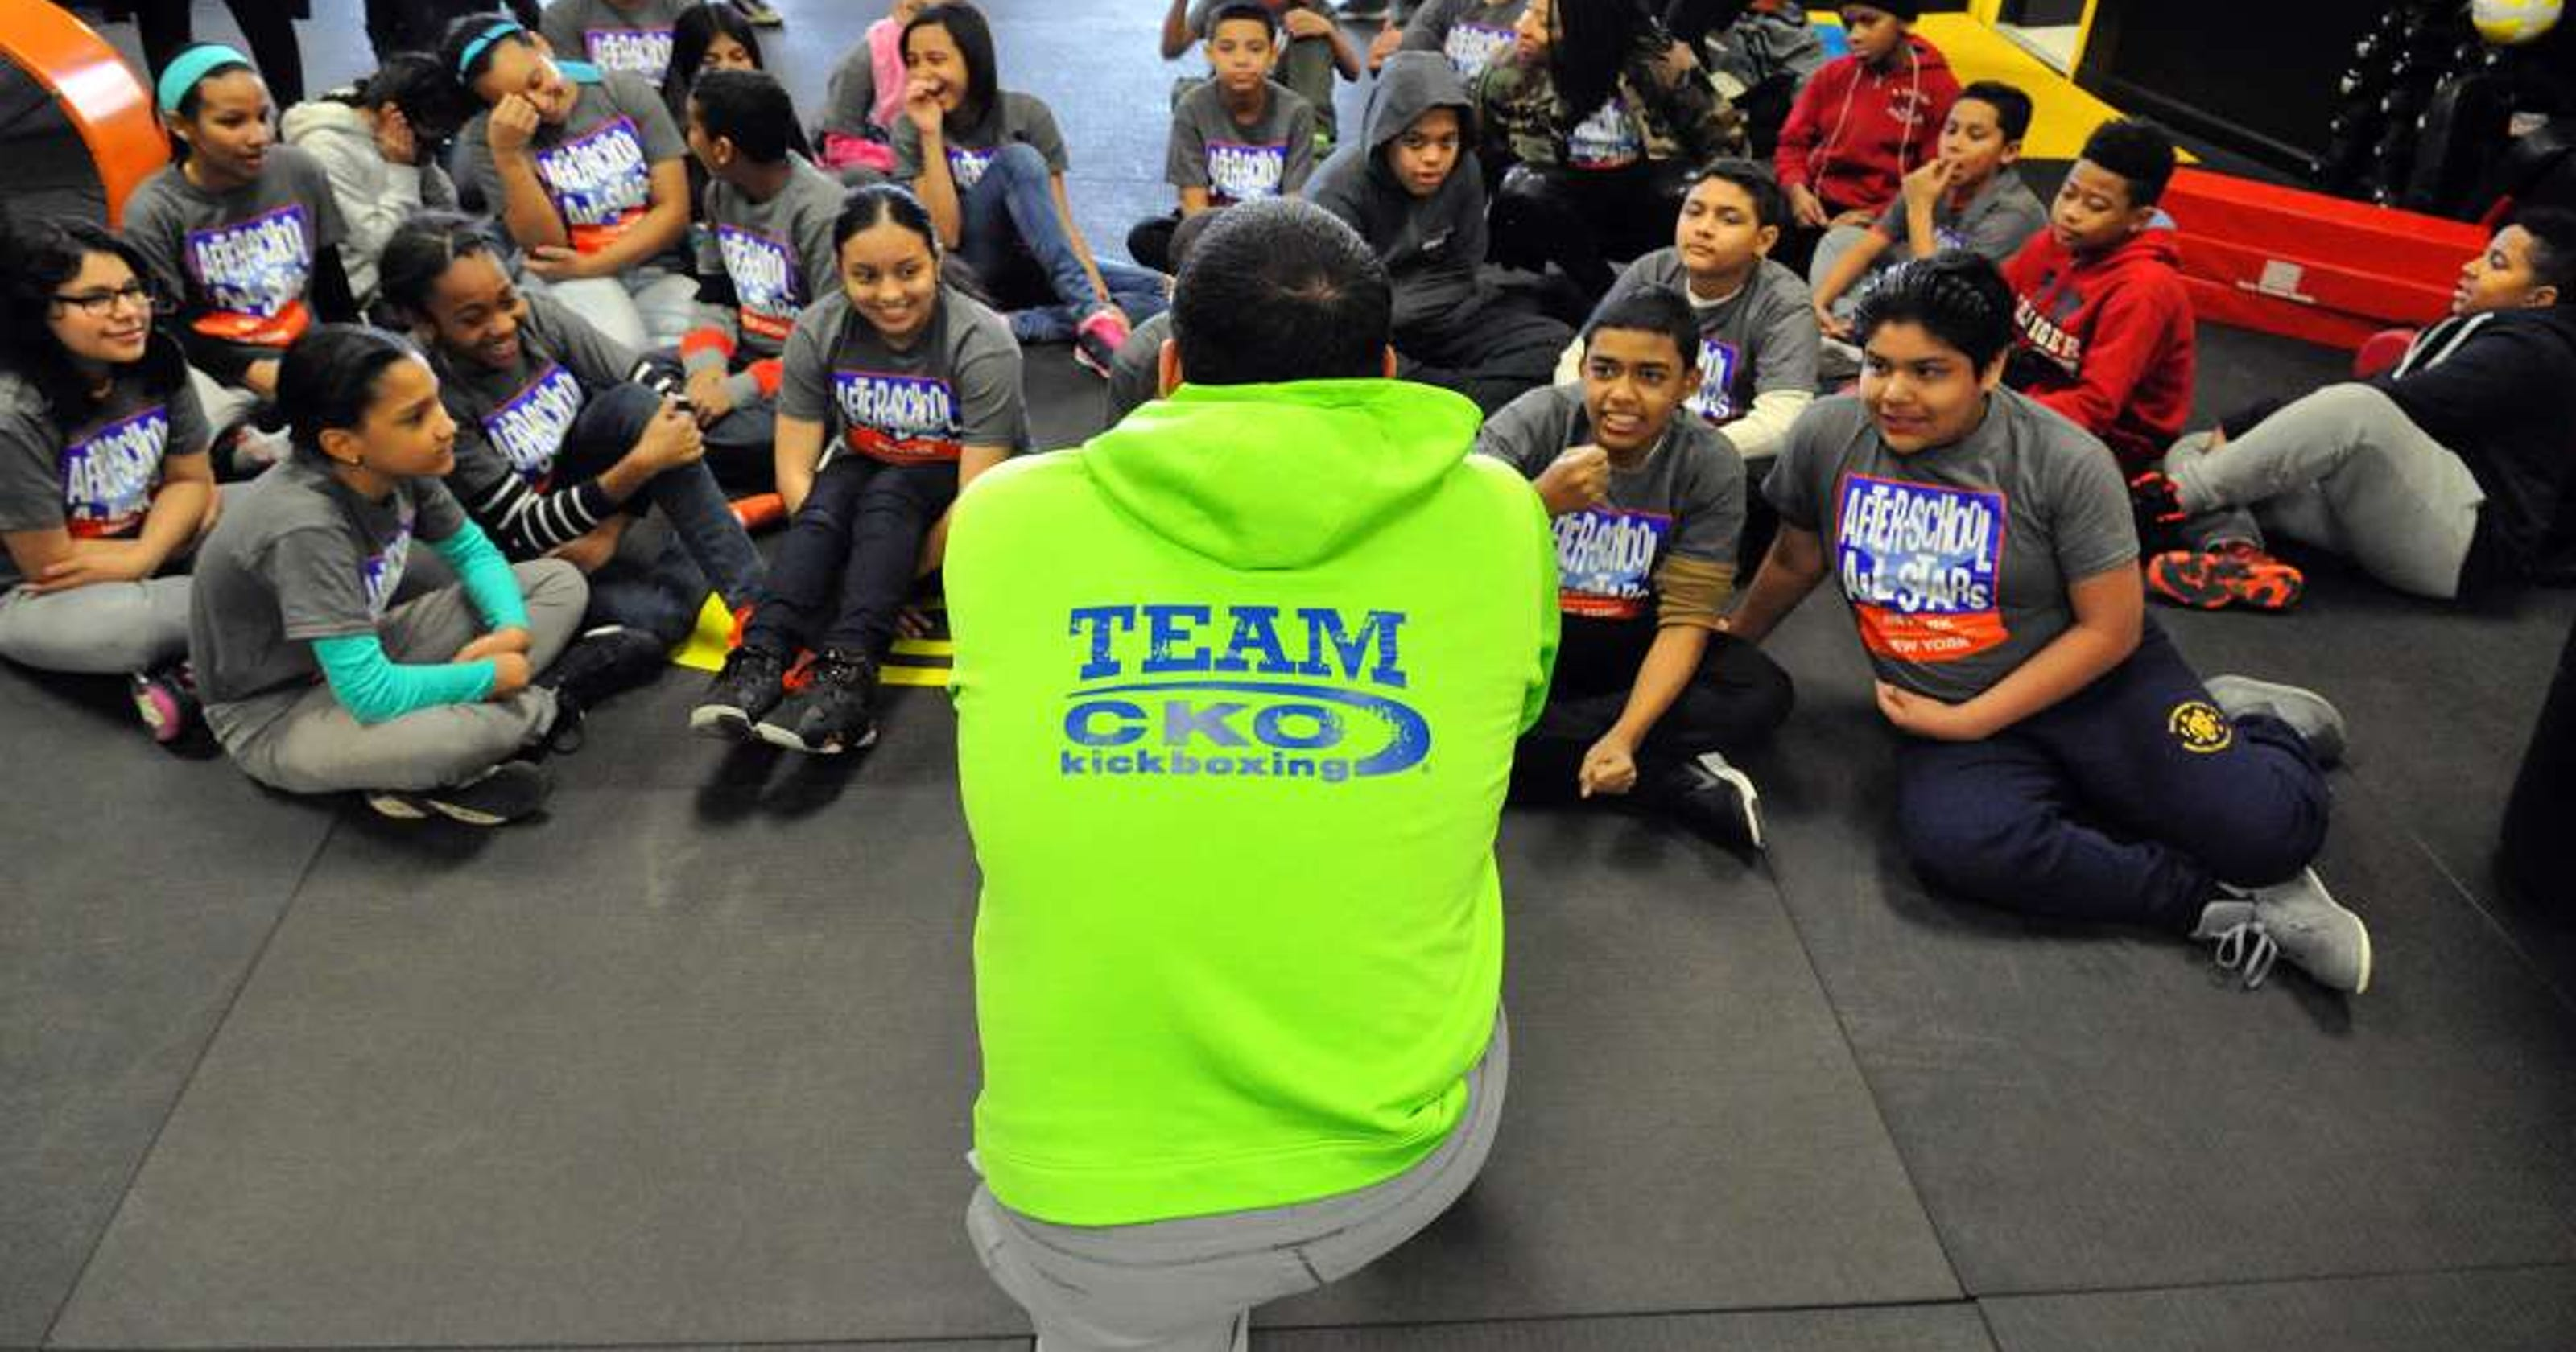 Kids kick it into gear at CKO Kickboxing in Wayne